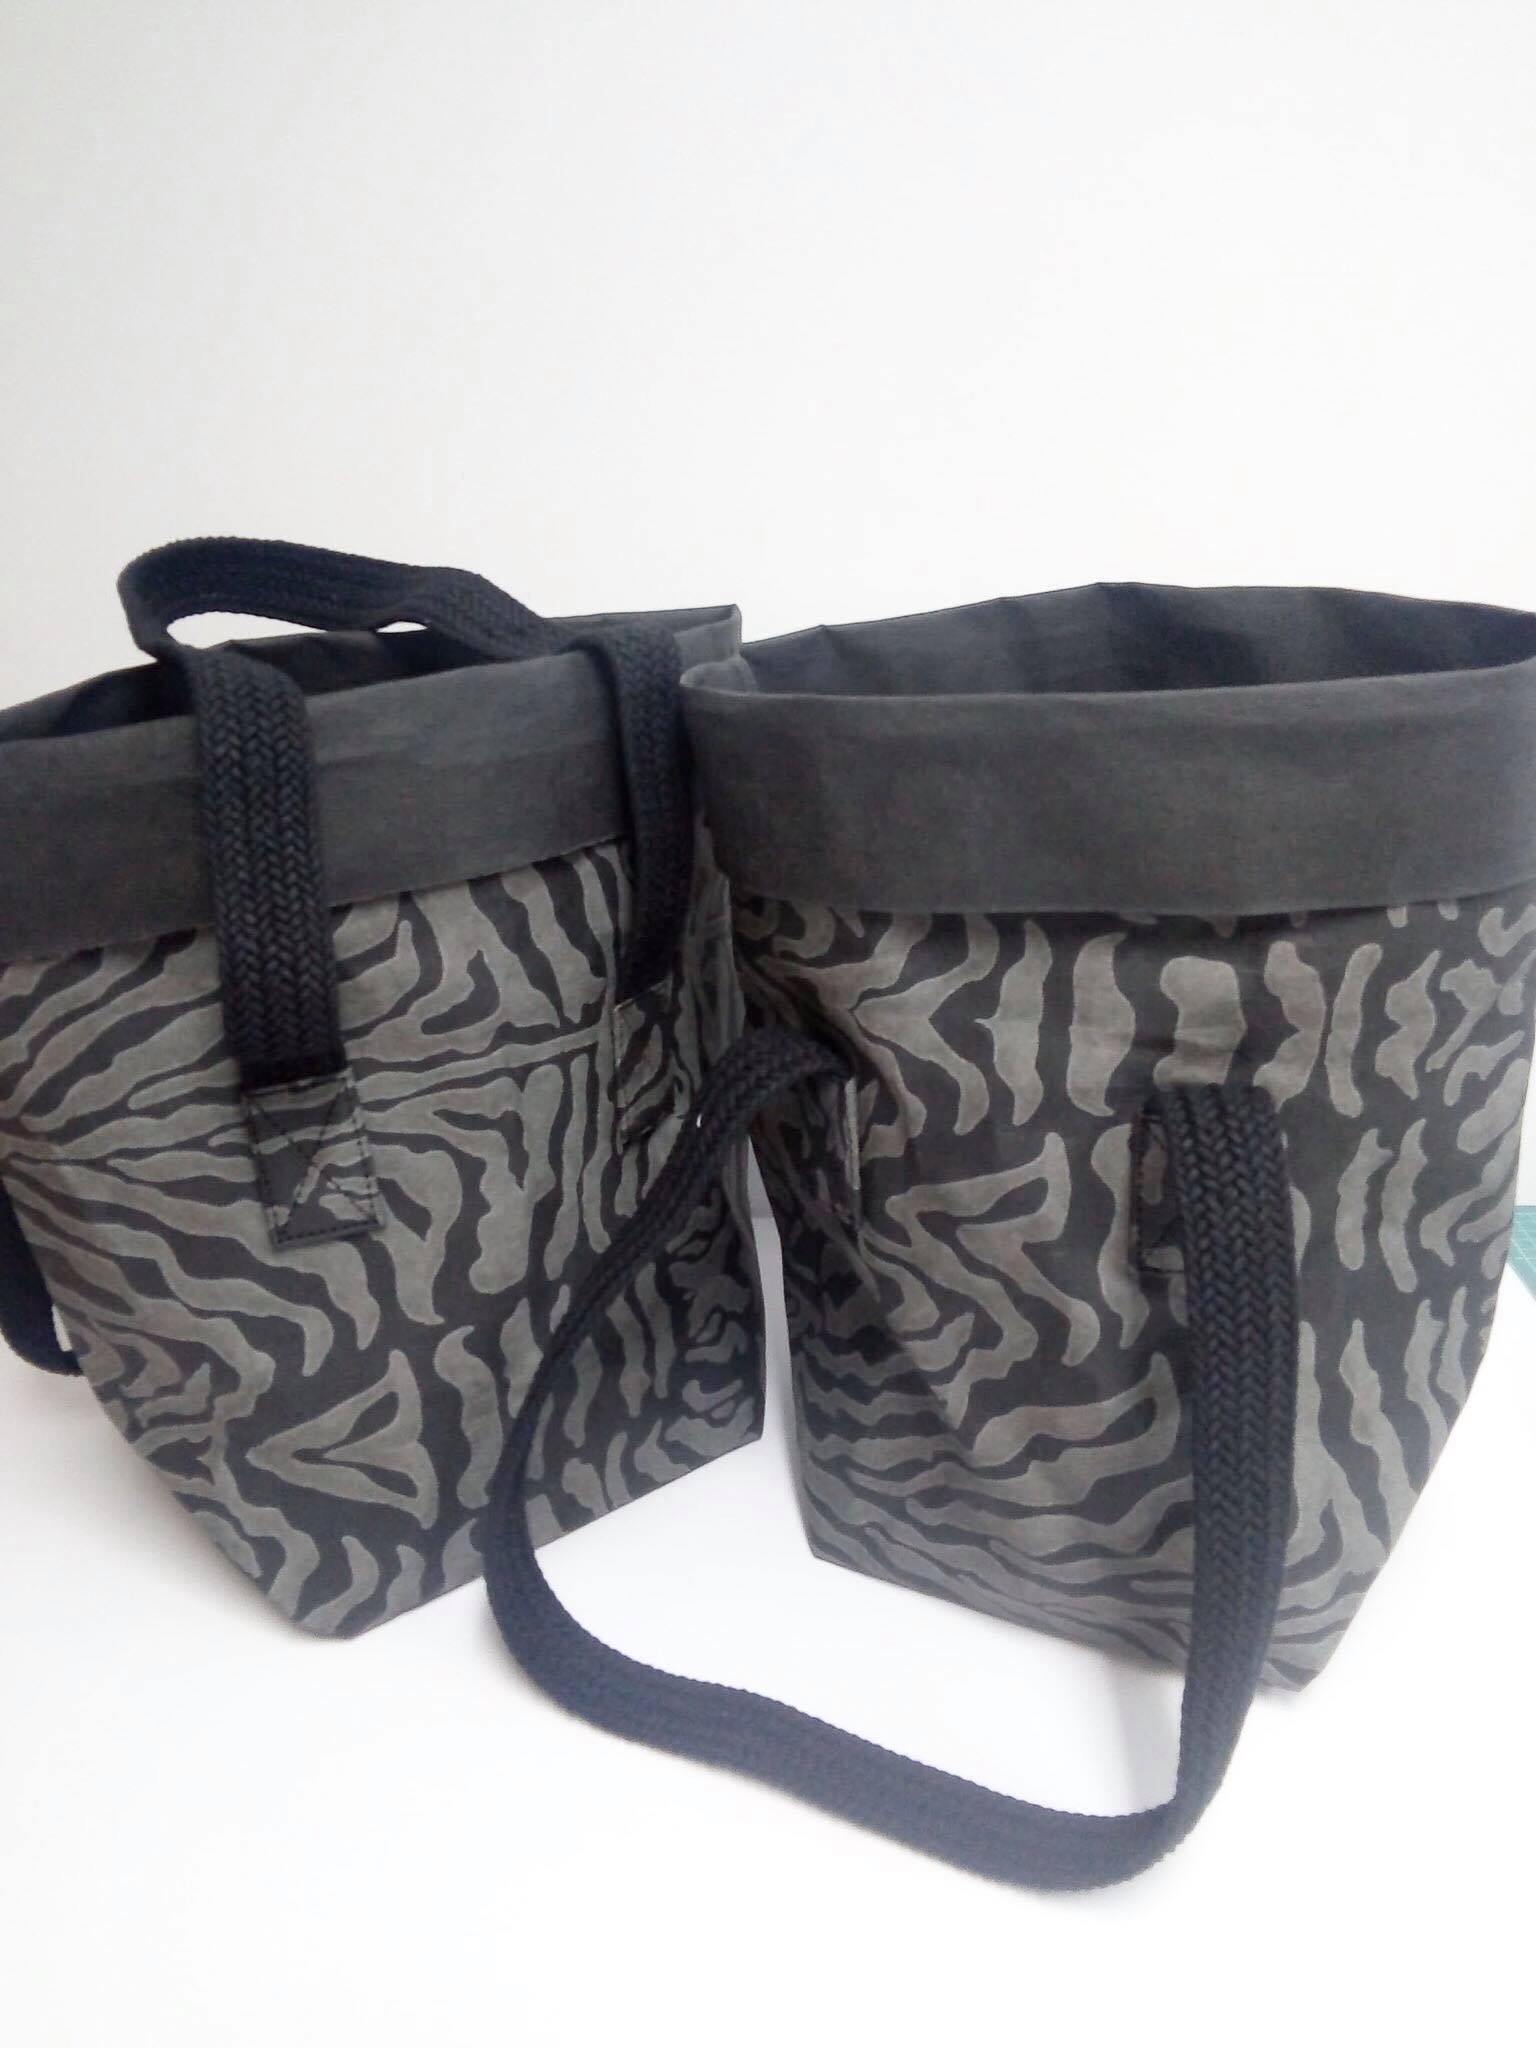 torba z washpapy wzory laser - sklep Alternative Tetiles